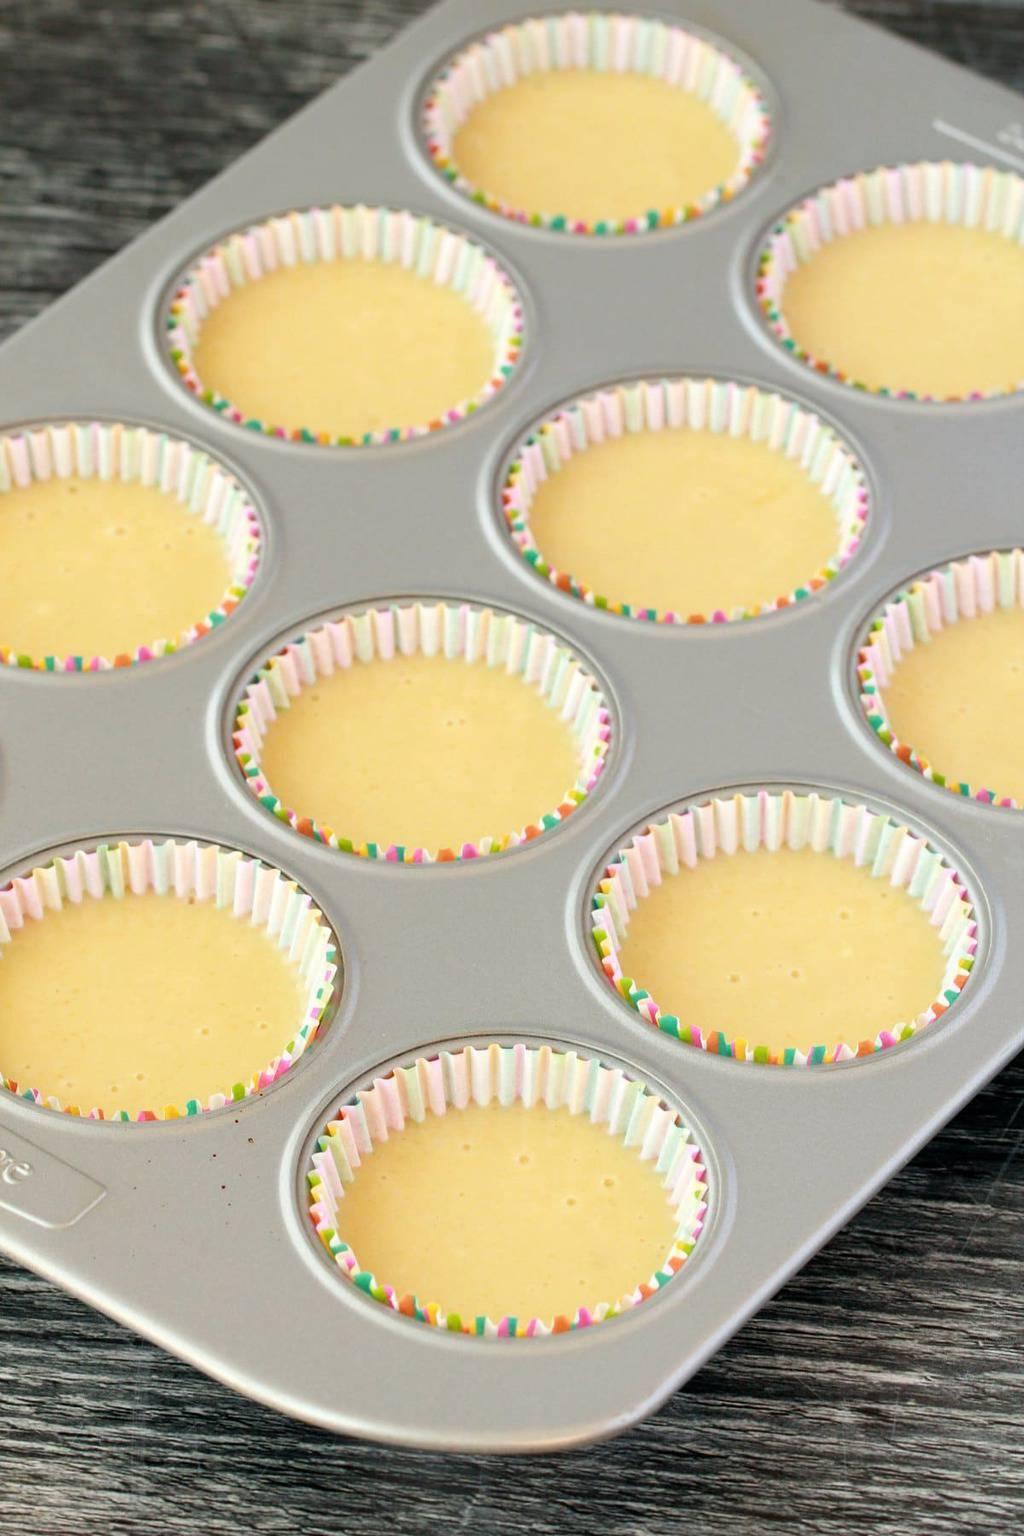 Making Vegan Peppermint Cupcakes #vegan #lovingitvegan #cupcakes #dairyfree